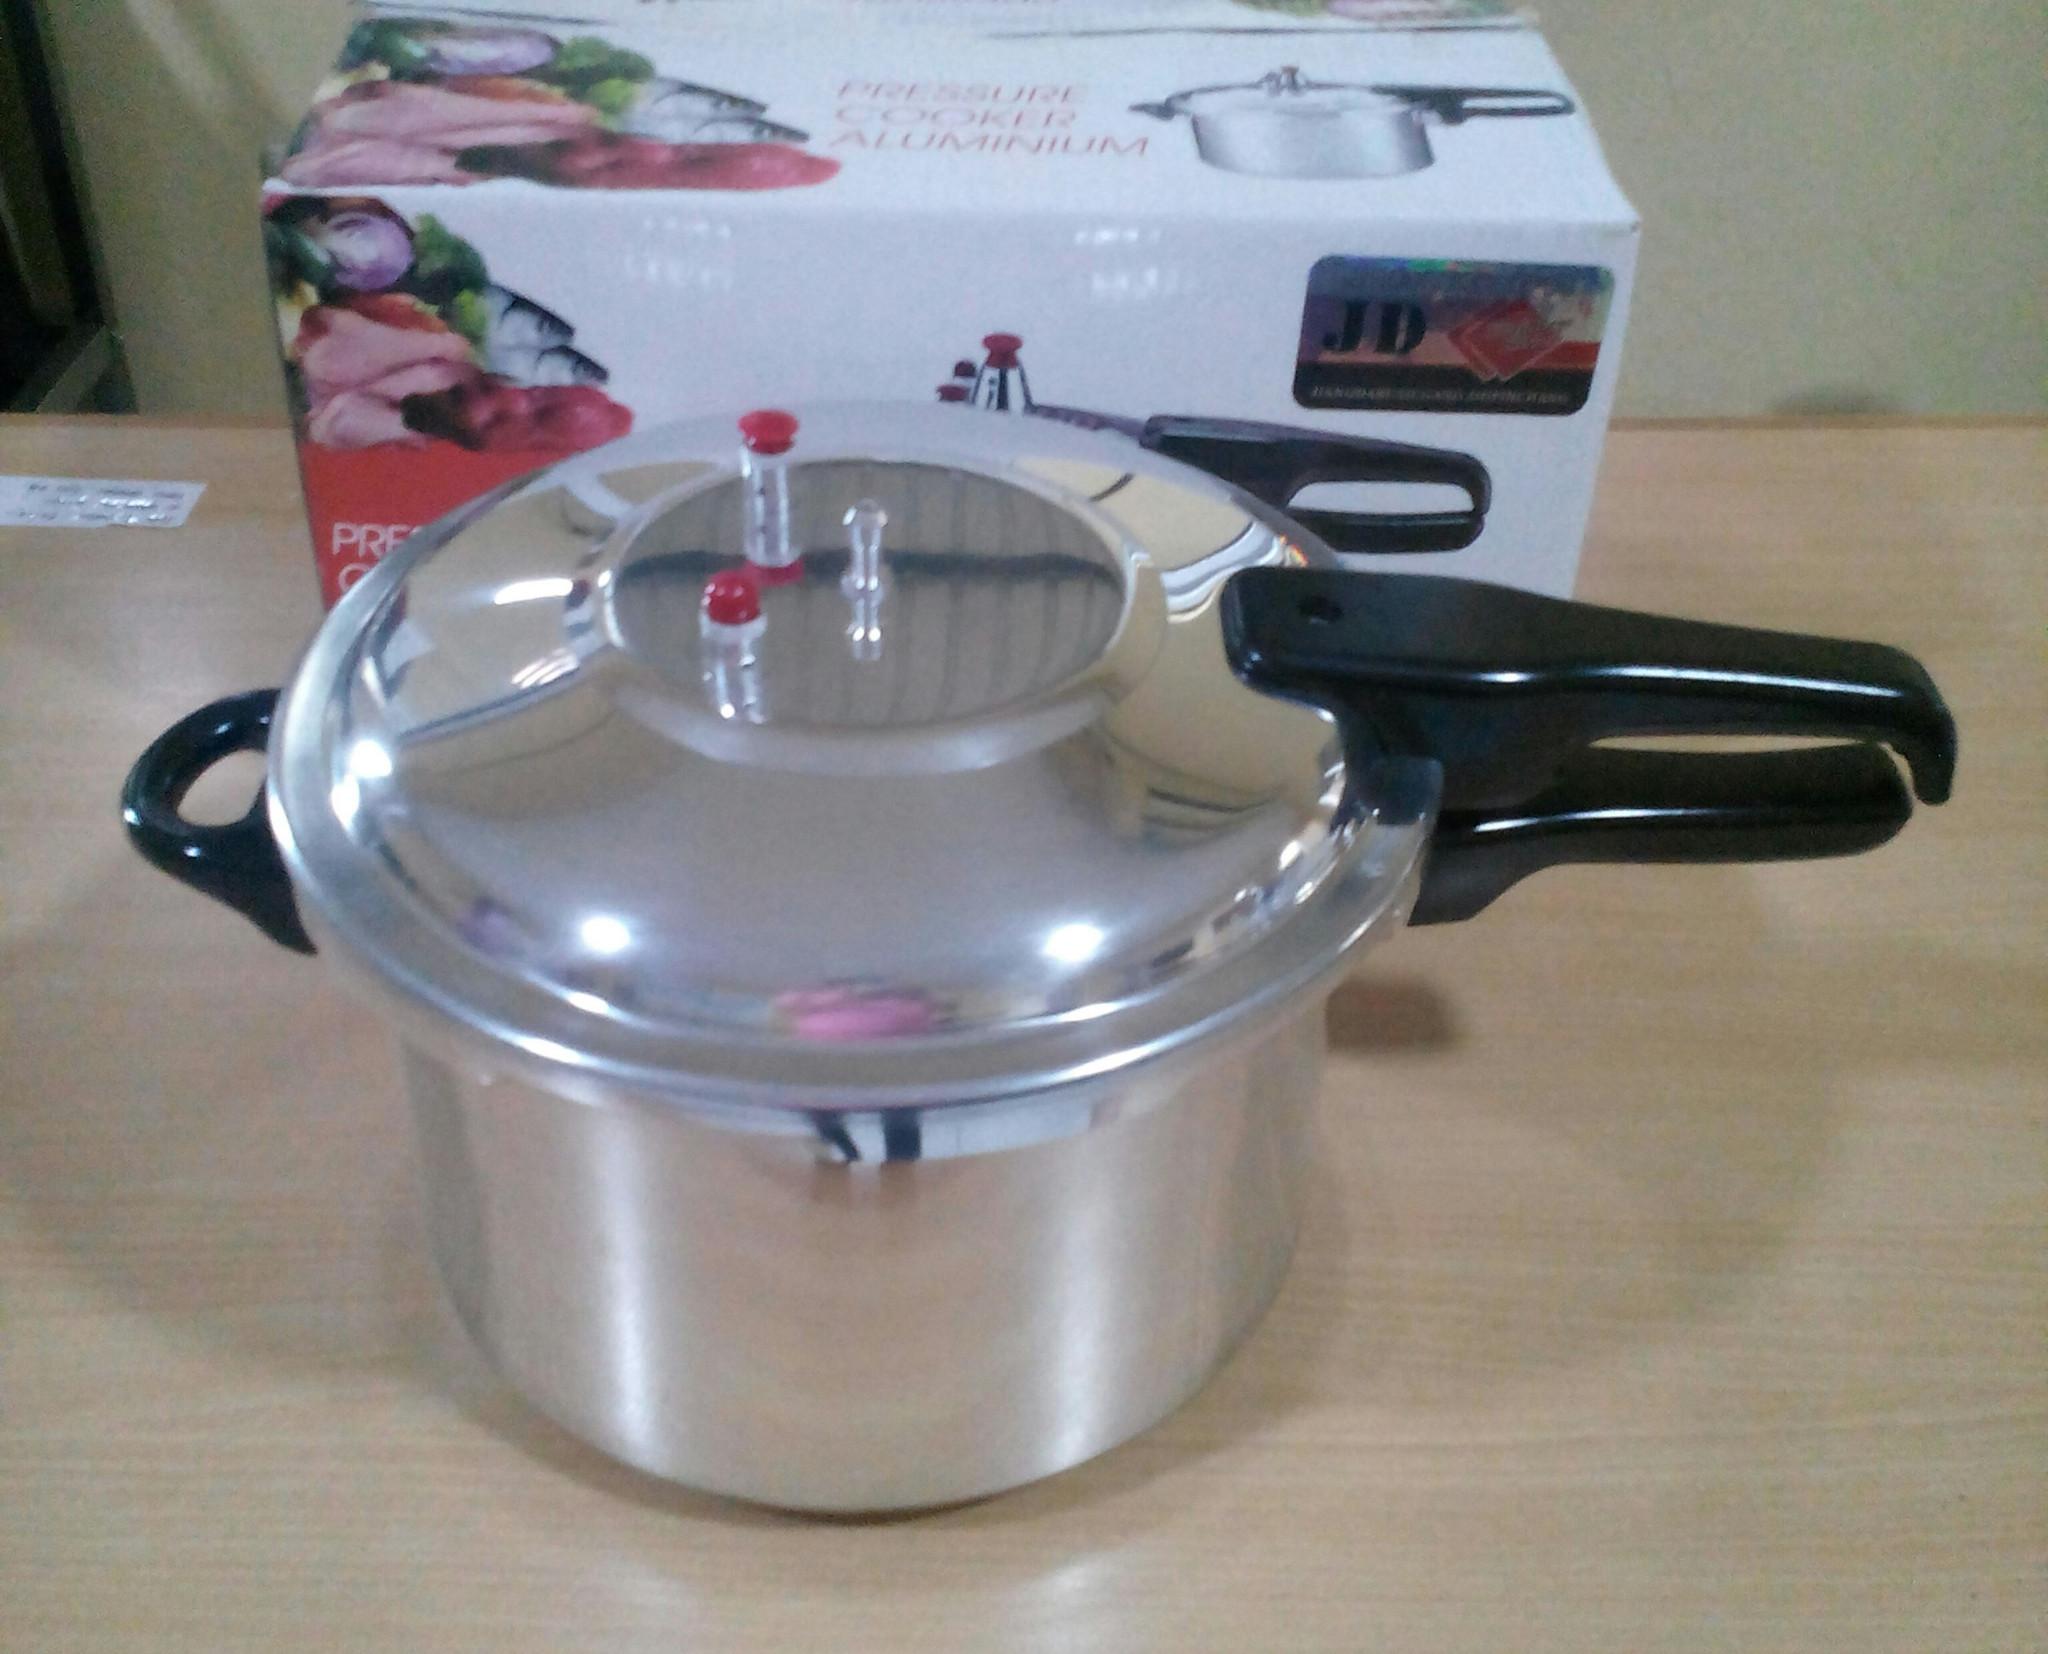 ... Lite Referensi Source · Trisonic Panci Pressure Cooker 8 Liter Stainless T 324 Daftar Source Panci Presto 26Cm 10